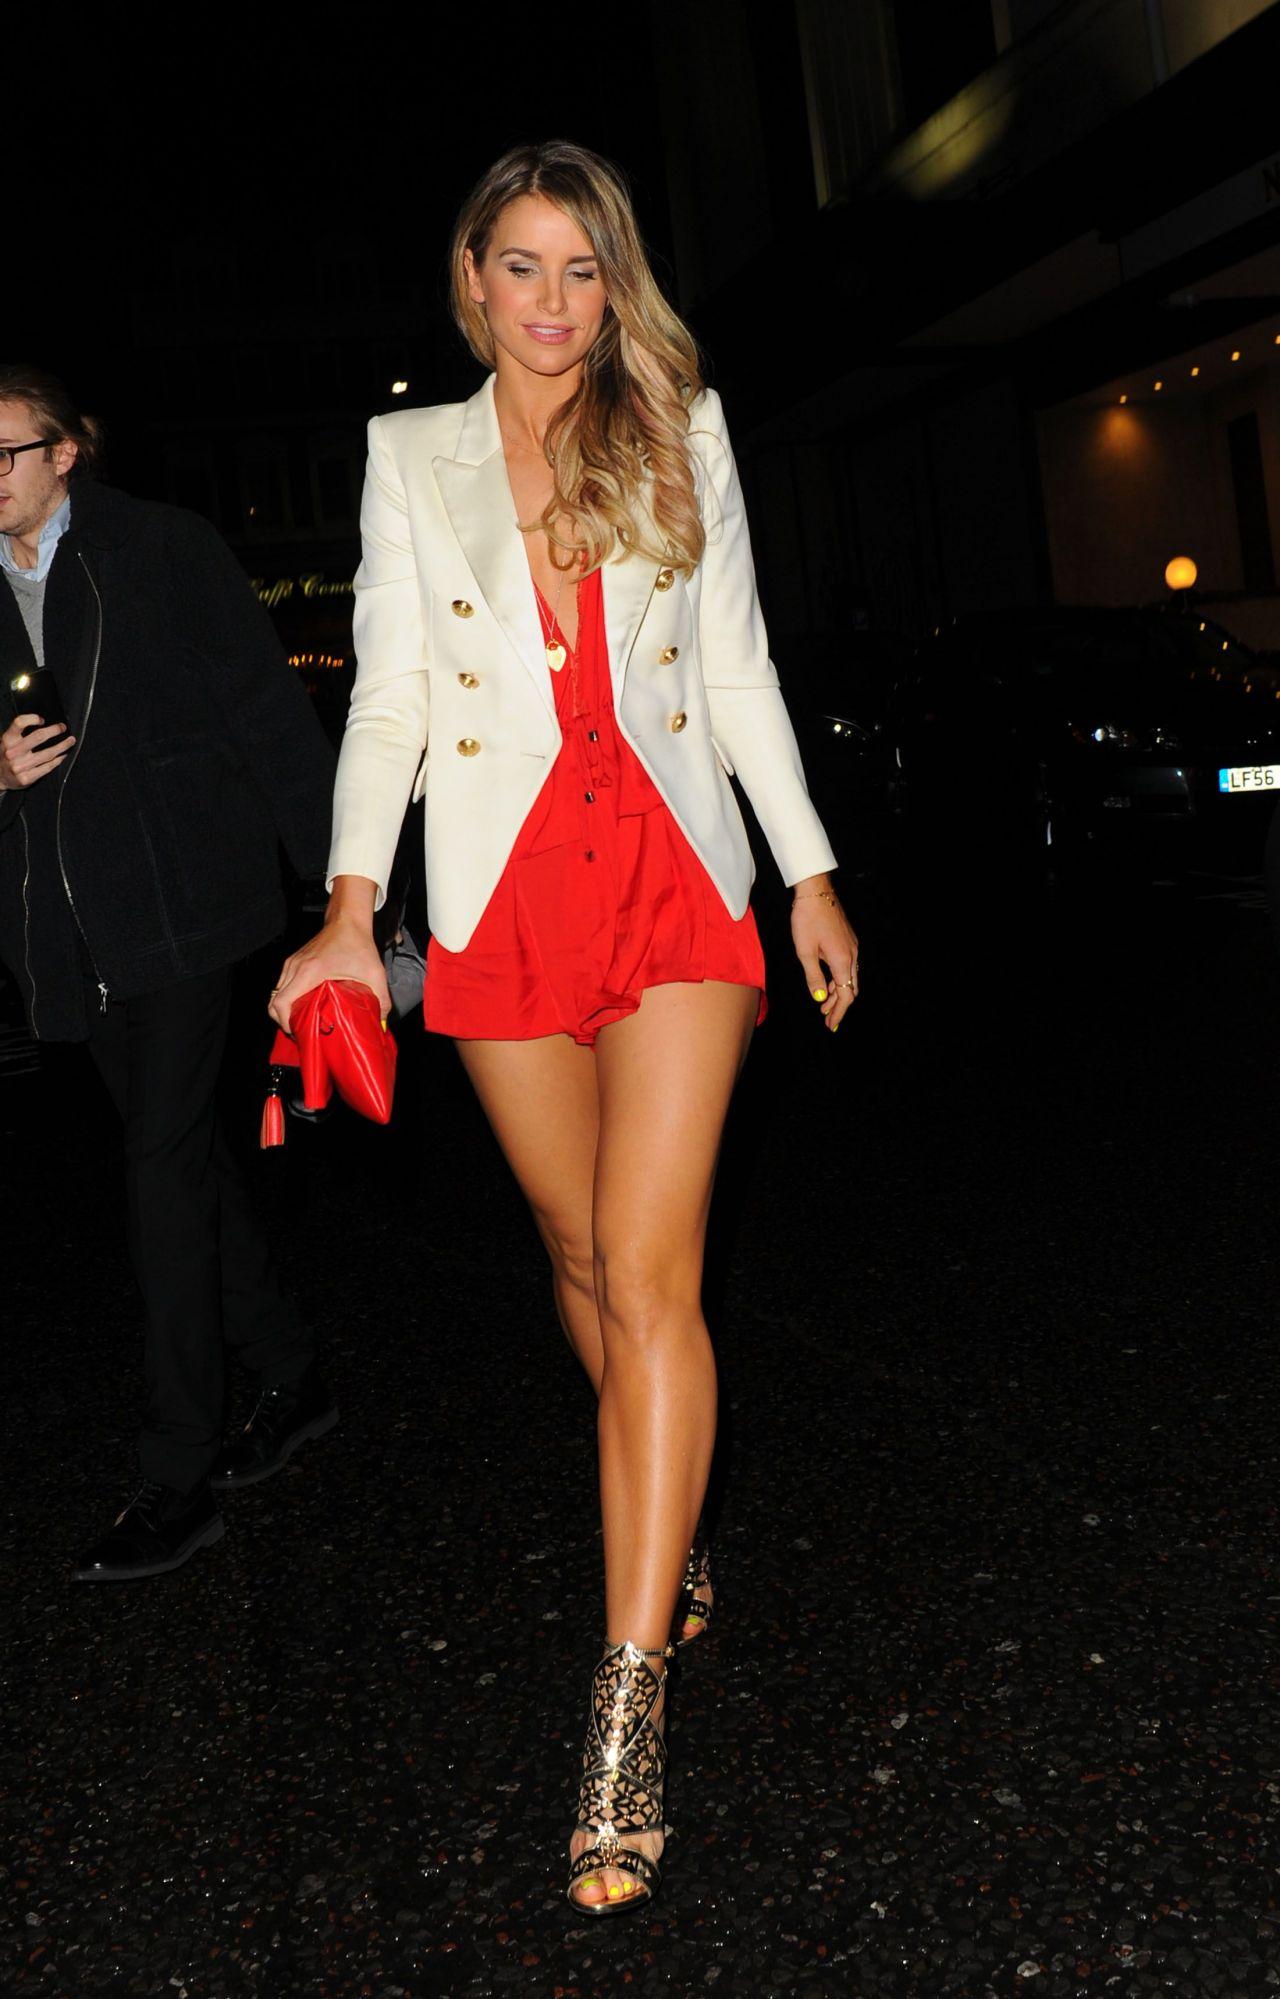 Vogue Williams Shows Legs James Ingham Jog Cancer Event London Kylie Minogue Poses Wax Figure